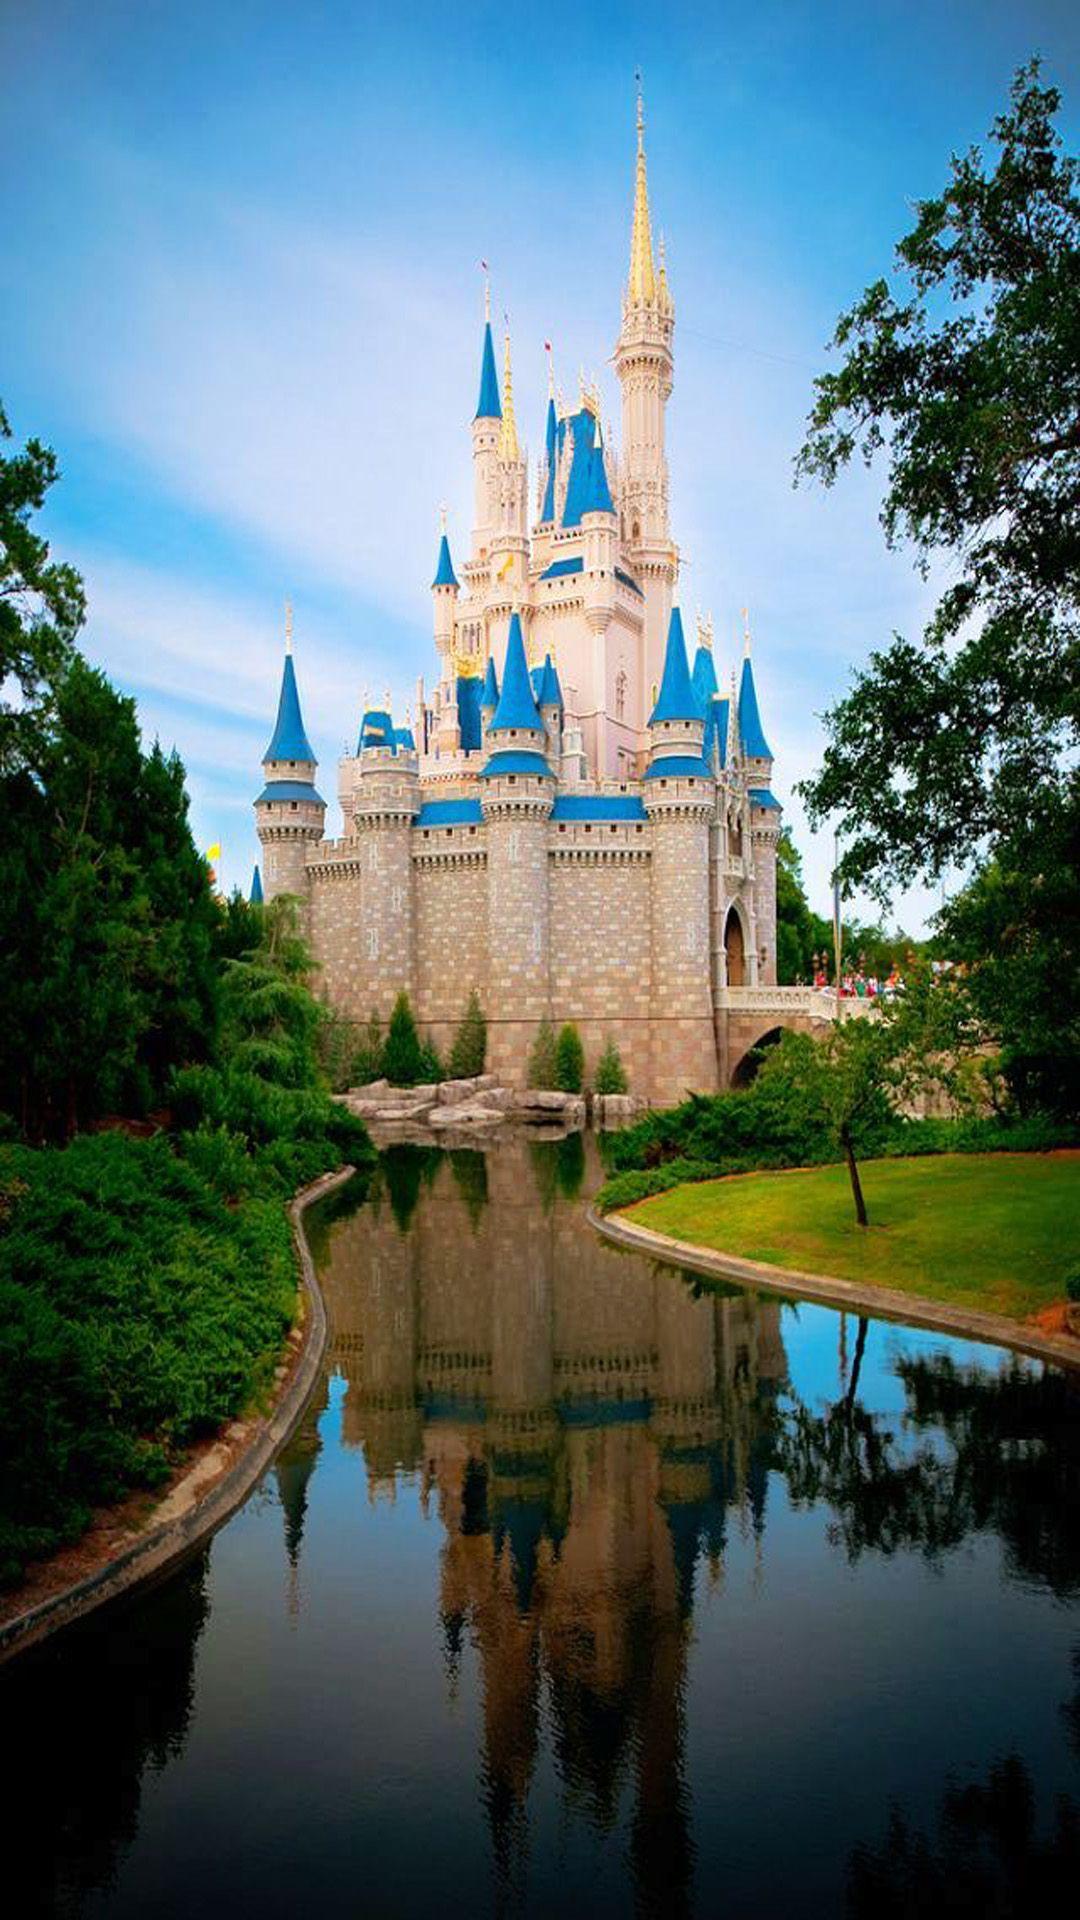 Disney Iphone Wallpapers Top Free Disney Iphone Backgrounds